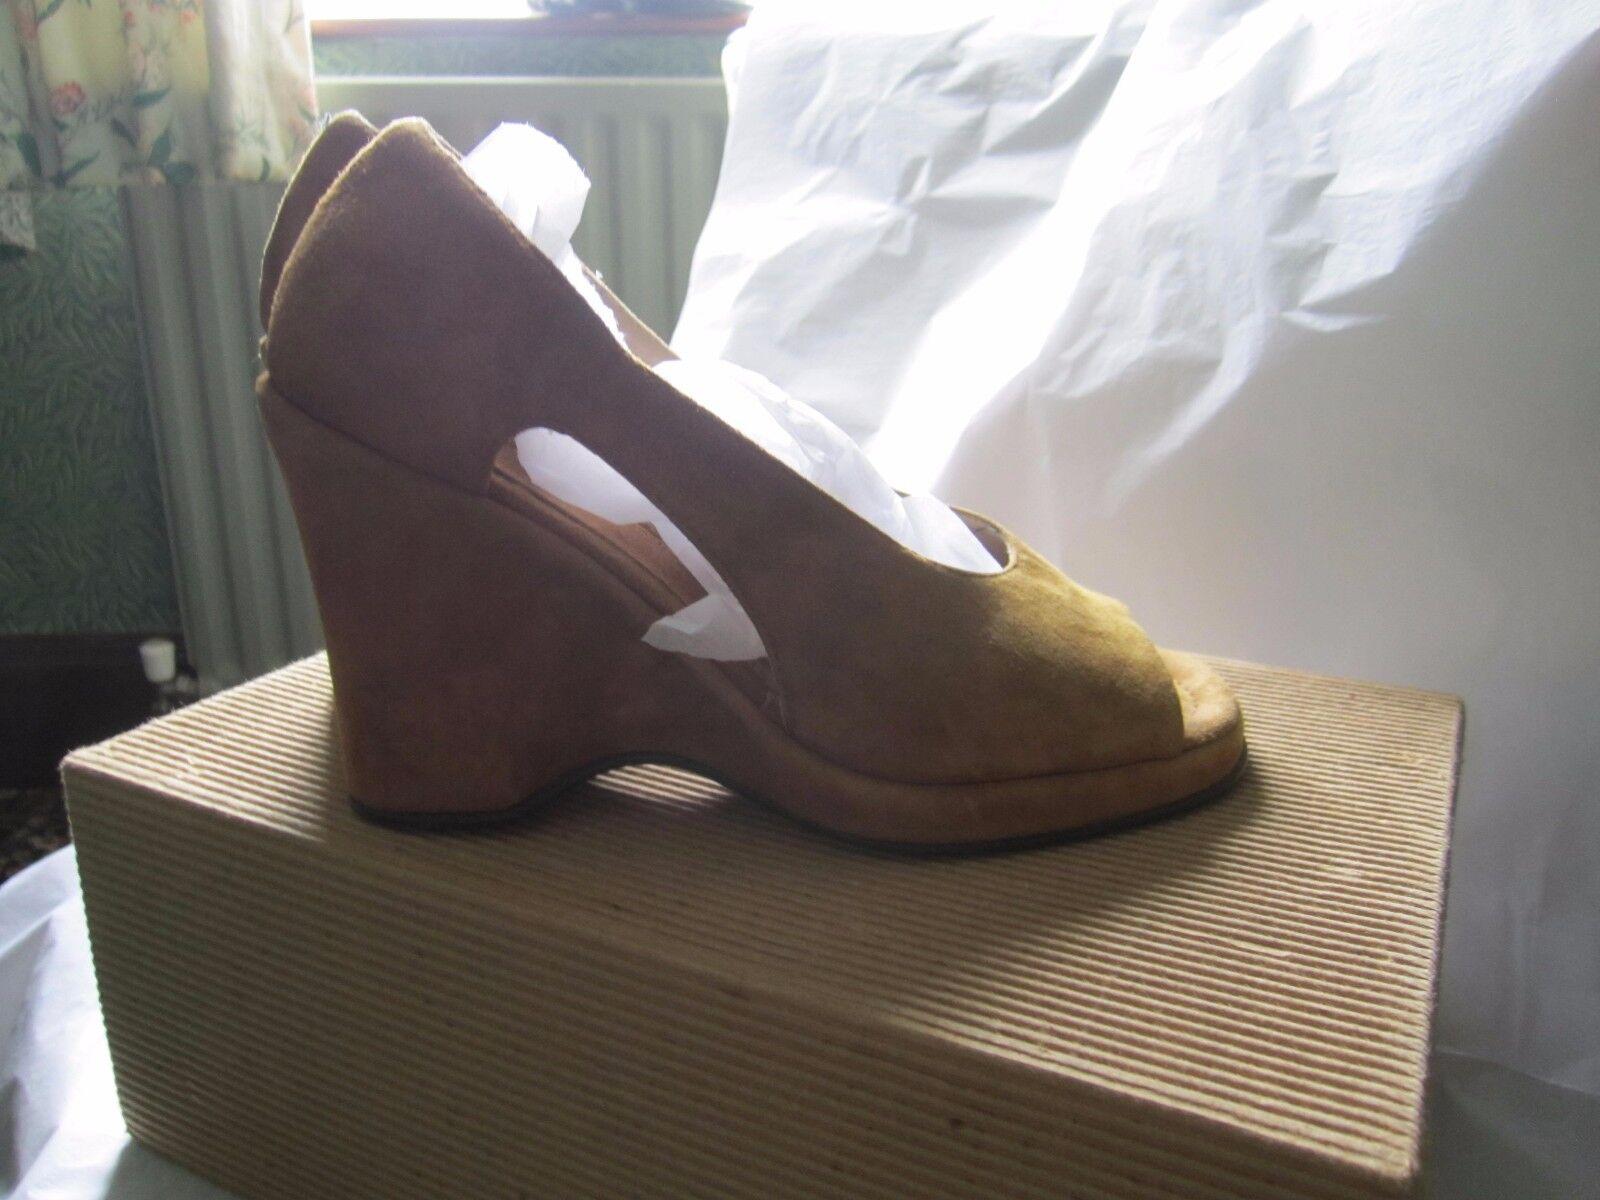 Armando de'alessandro . Size 35 NEW SHOES BOXED  36